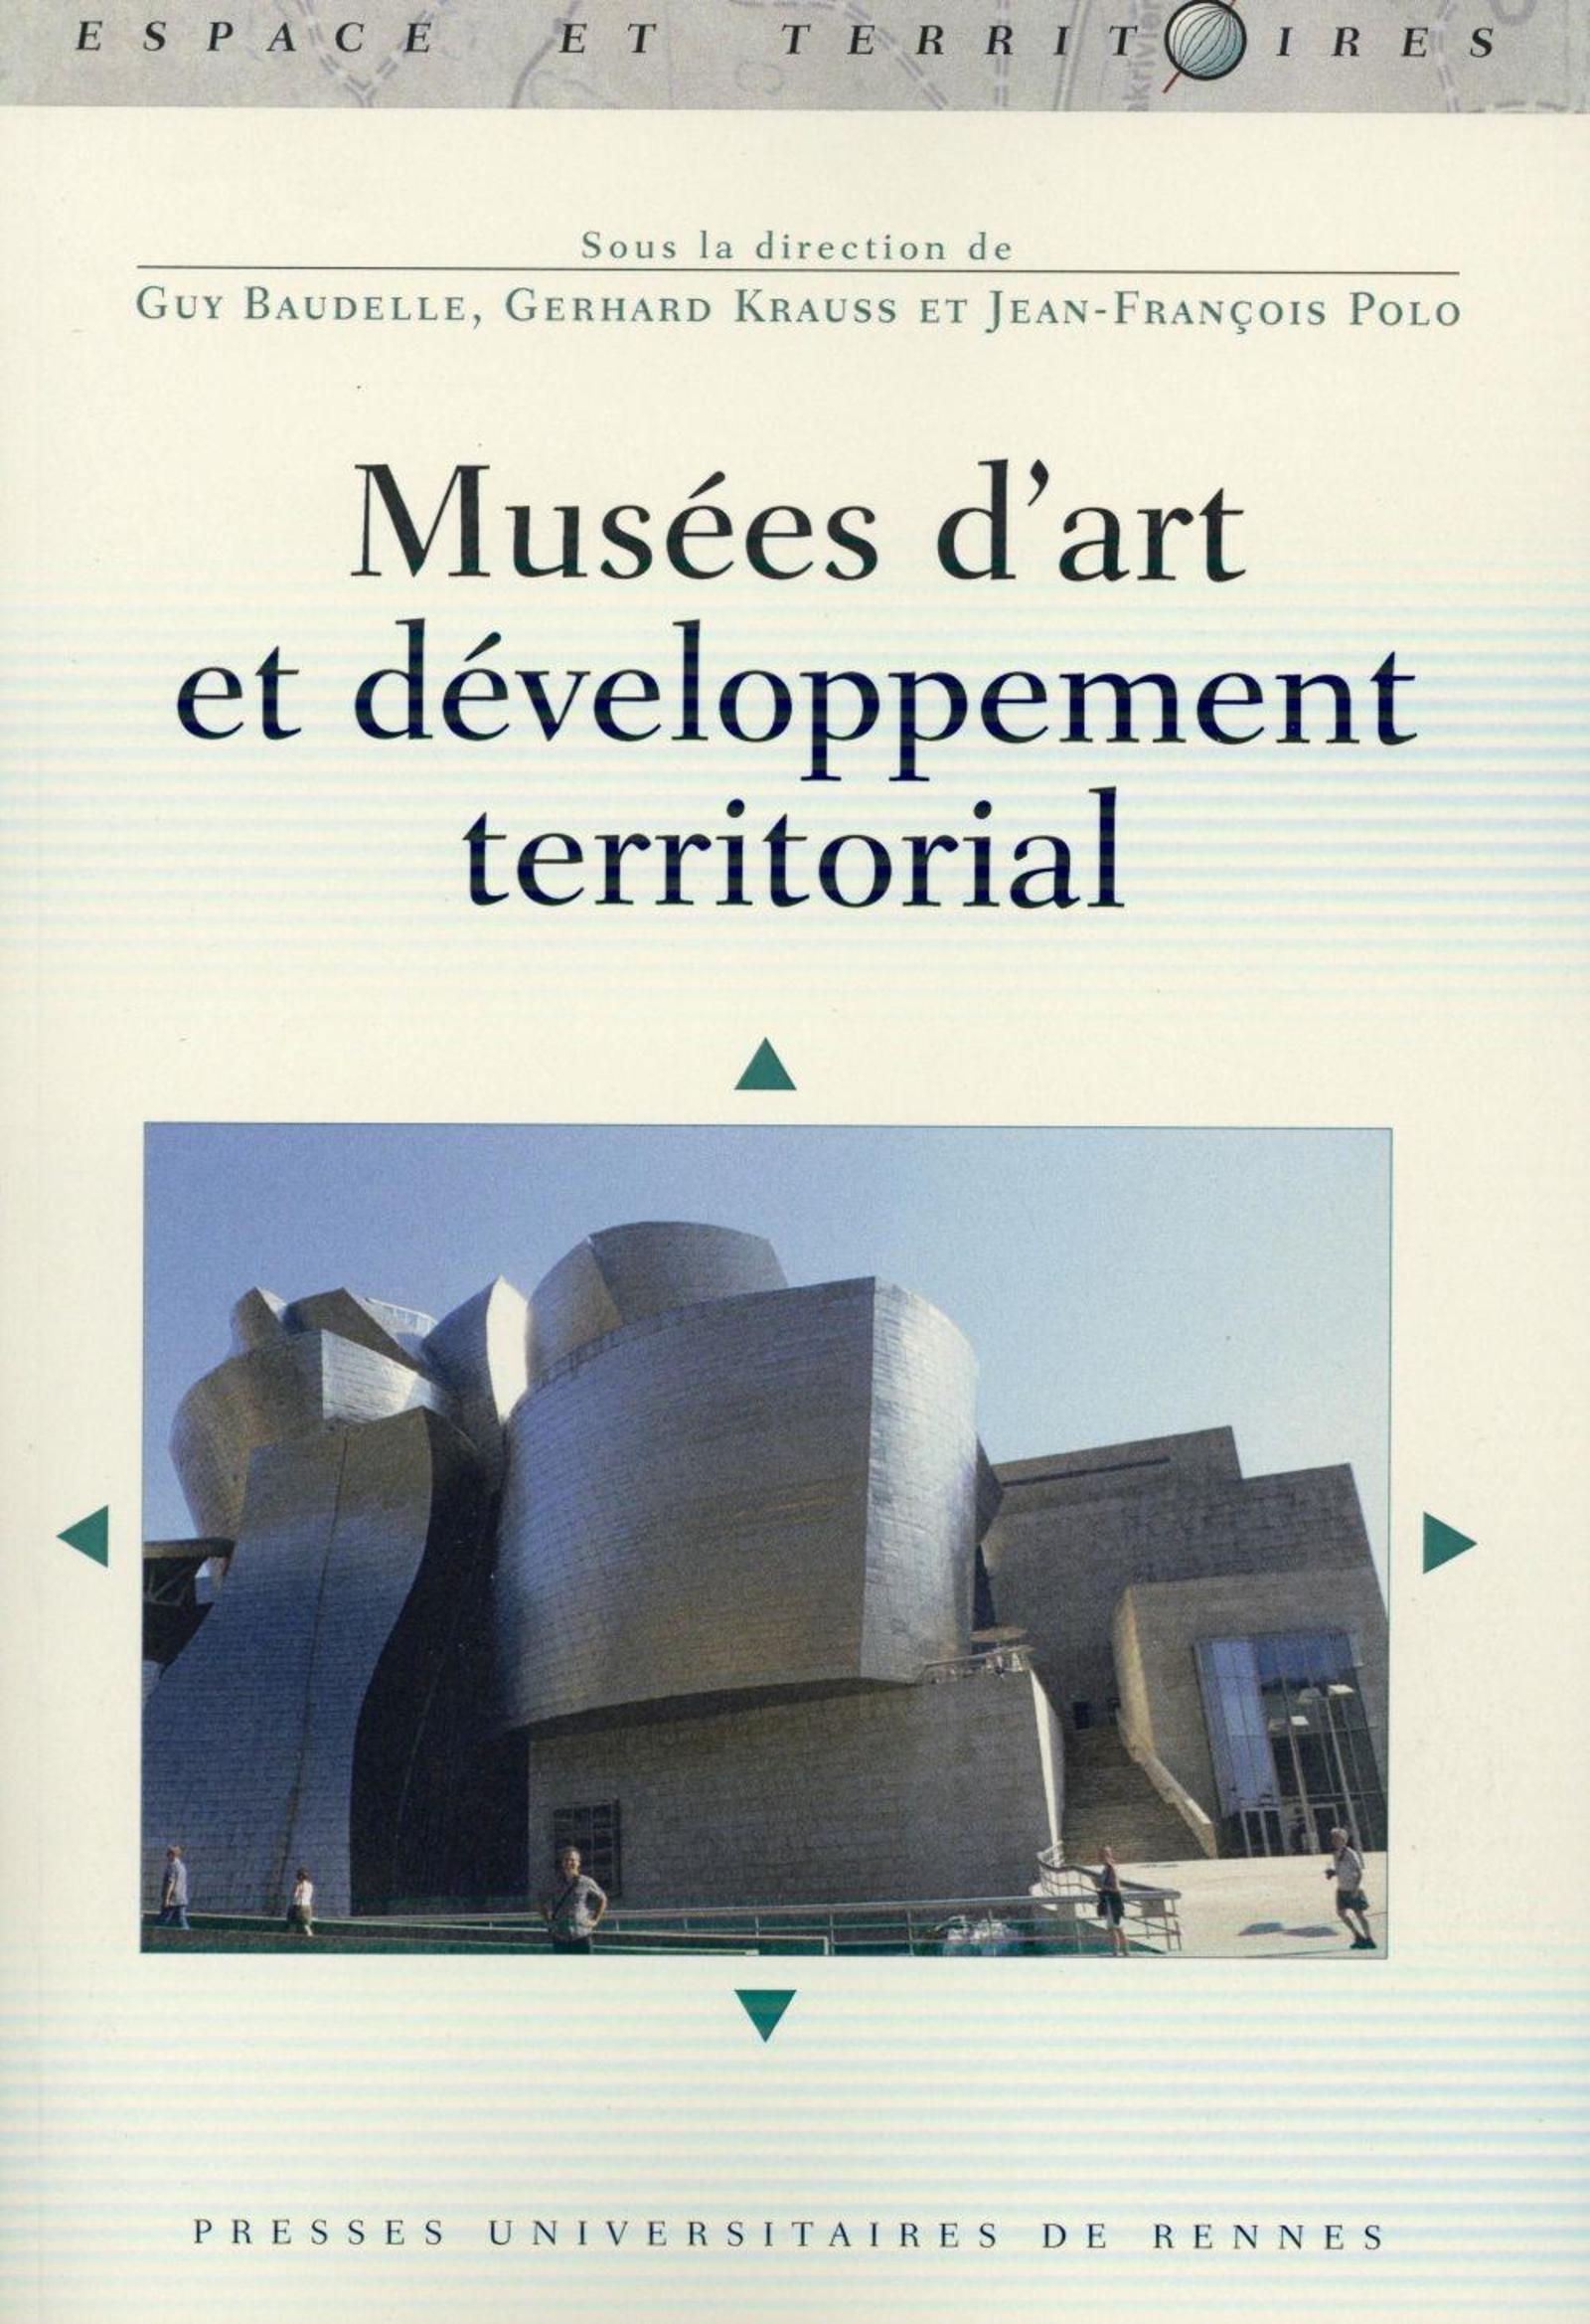 MUSEES D'ART ET DEVELOPPEMENT TERRITORIAL